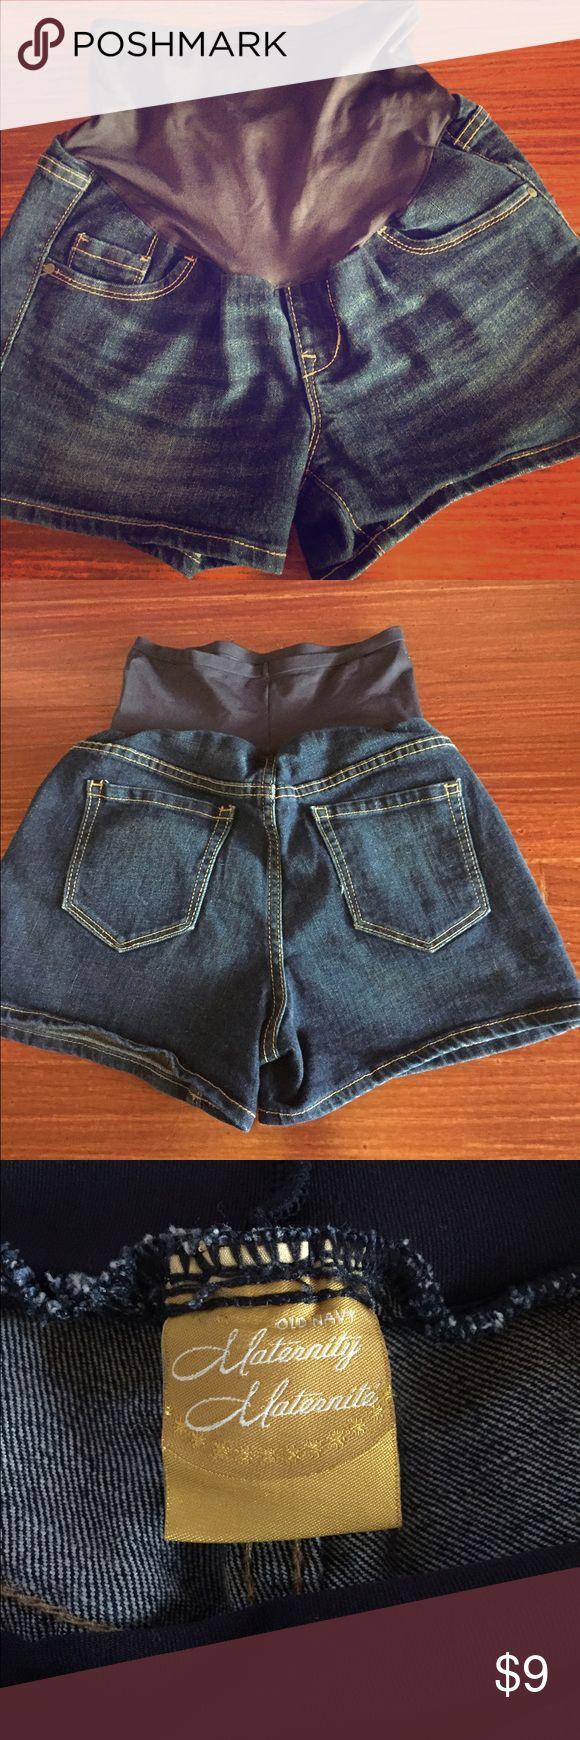 Old Navy maternity Jean shorts size 4 Old Navy Maternity Jean shorts size 4. Stretchy full belly panel, cotton/poly/spandex. Hardly worn!!! Old Navy Shorts Jean Shorts